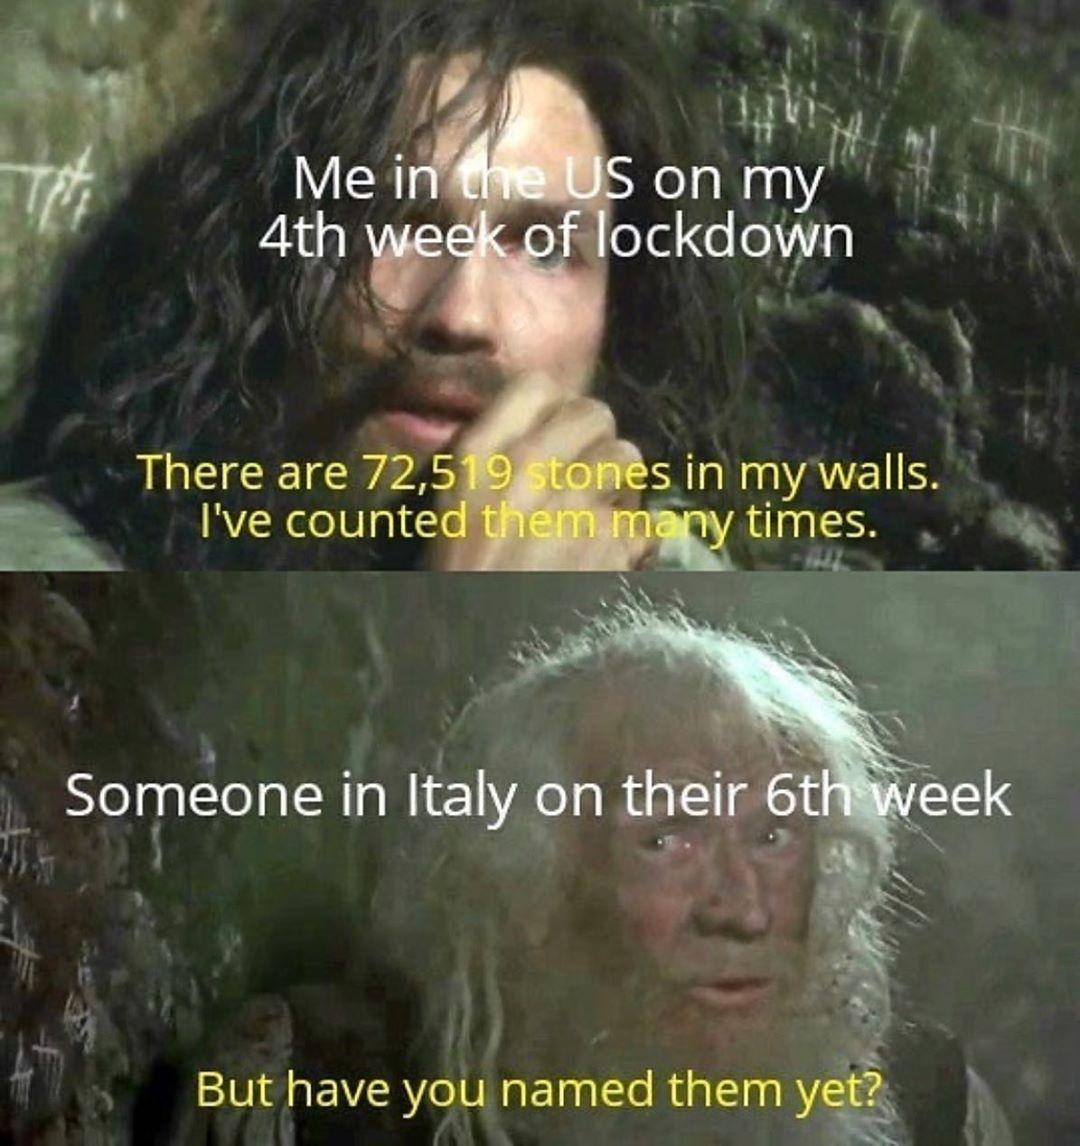 Meme S Quotes Memes Its Memes Laughing Memes Memes Quotes Funnie Memes I Meme Truthful Memes Happy Stupid Funny Memes Funny Relatable Memes Funny Memes